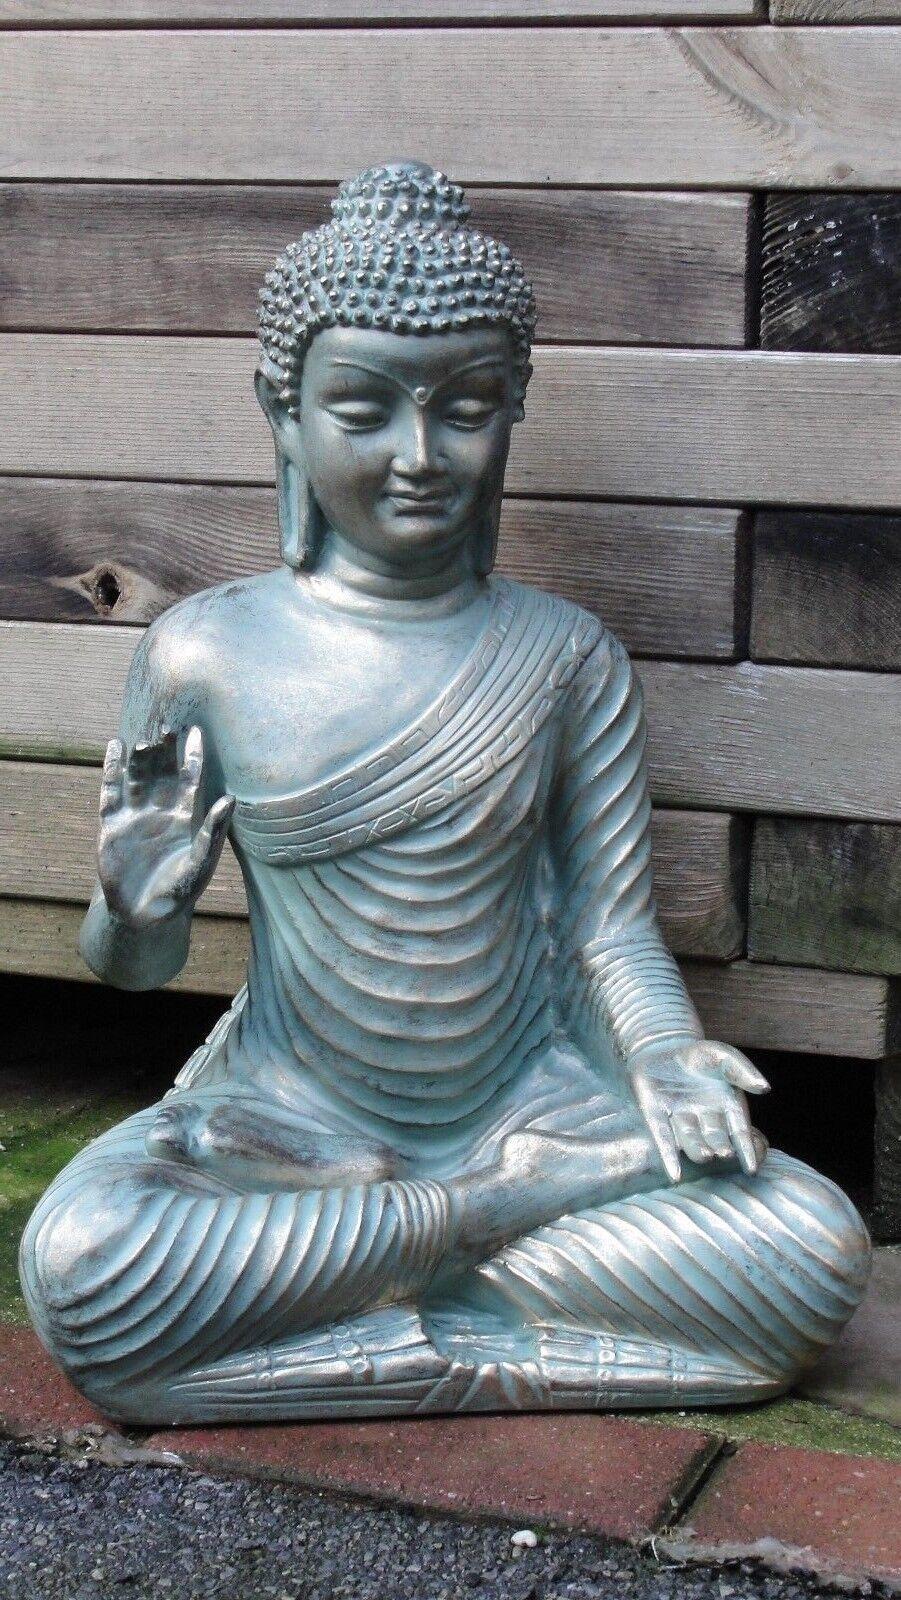 Buddha Budda Groß Statue Feng Shui GKunsten Figur Wetterfest Tempelwächter  G-G